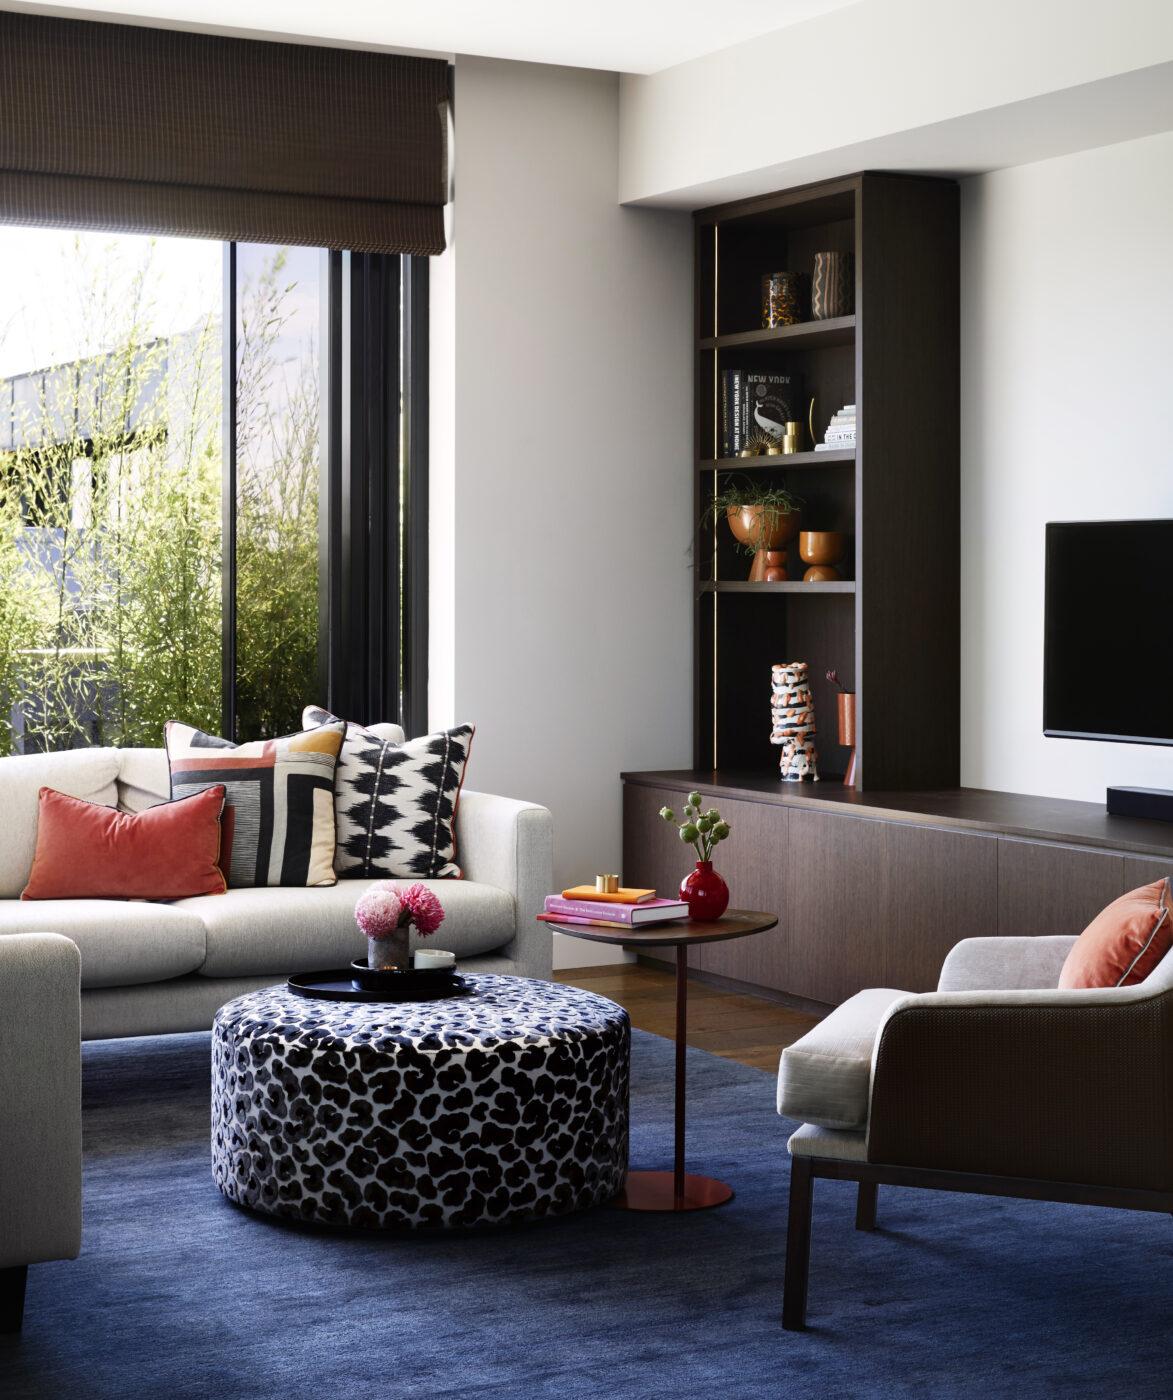 Camilla-Molders-Design-Interior-Design-Decoration-Melbourne-Hawthorn-Apartment-Interior-Design-renovation